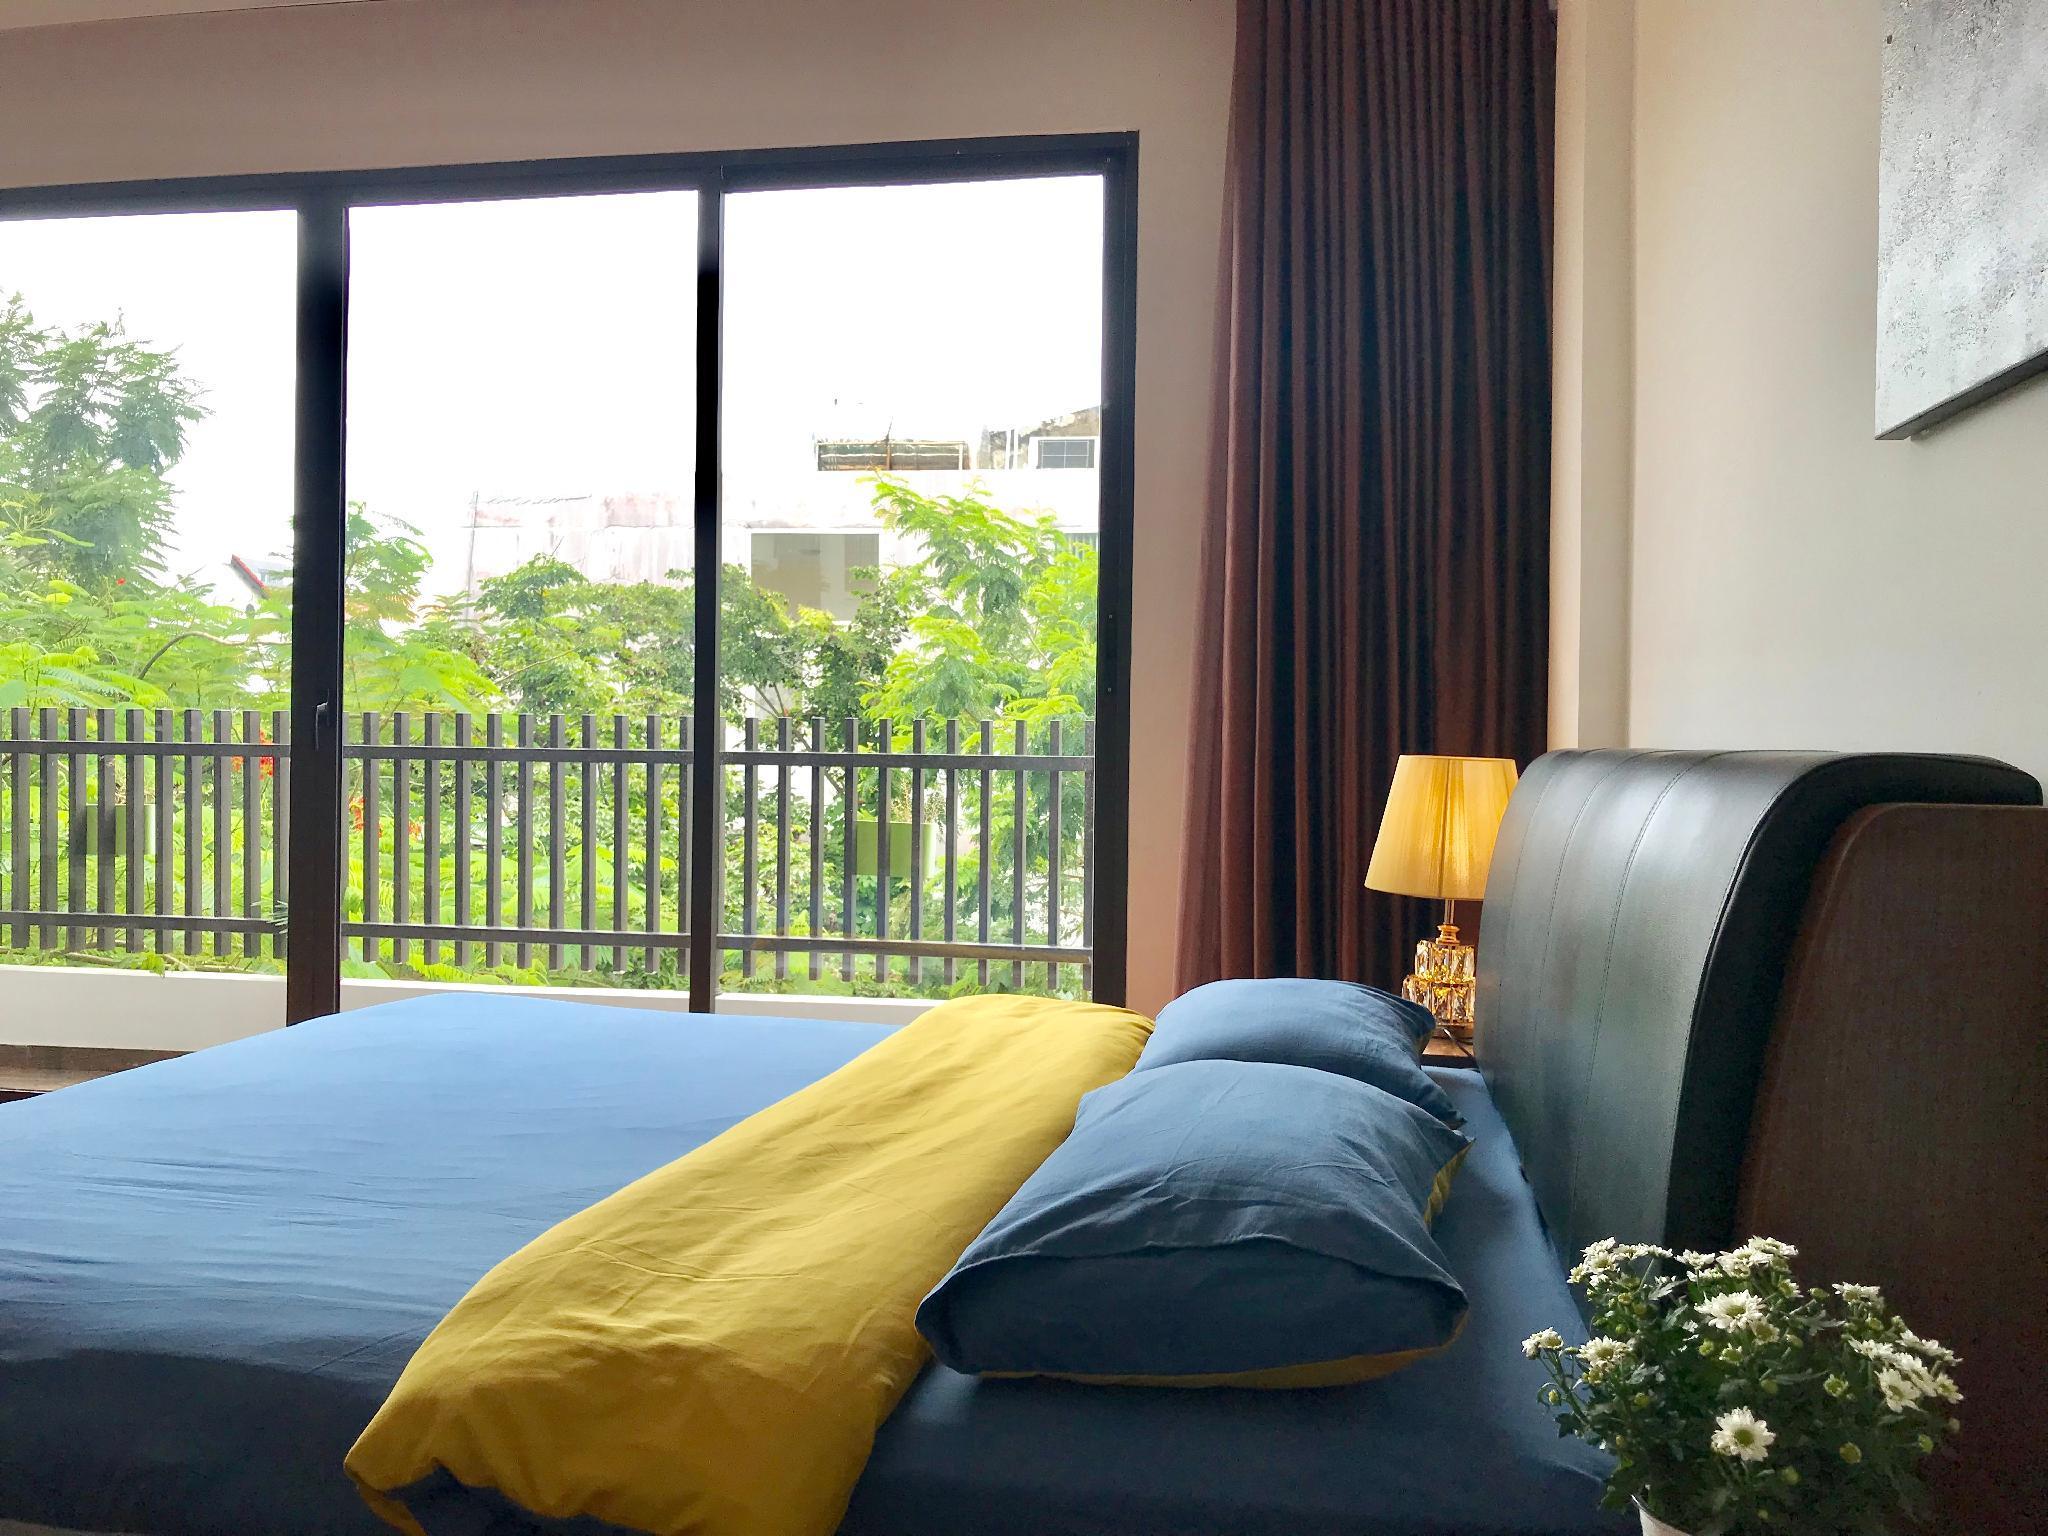 Apartment   Balcony   City View   Smart Home 15